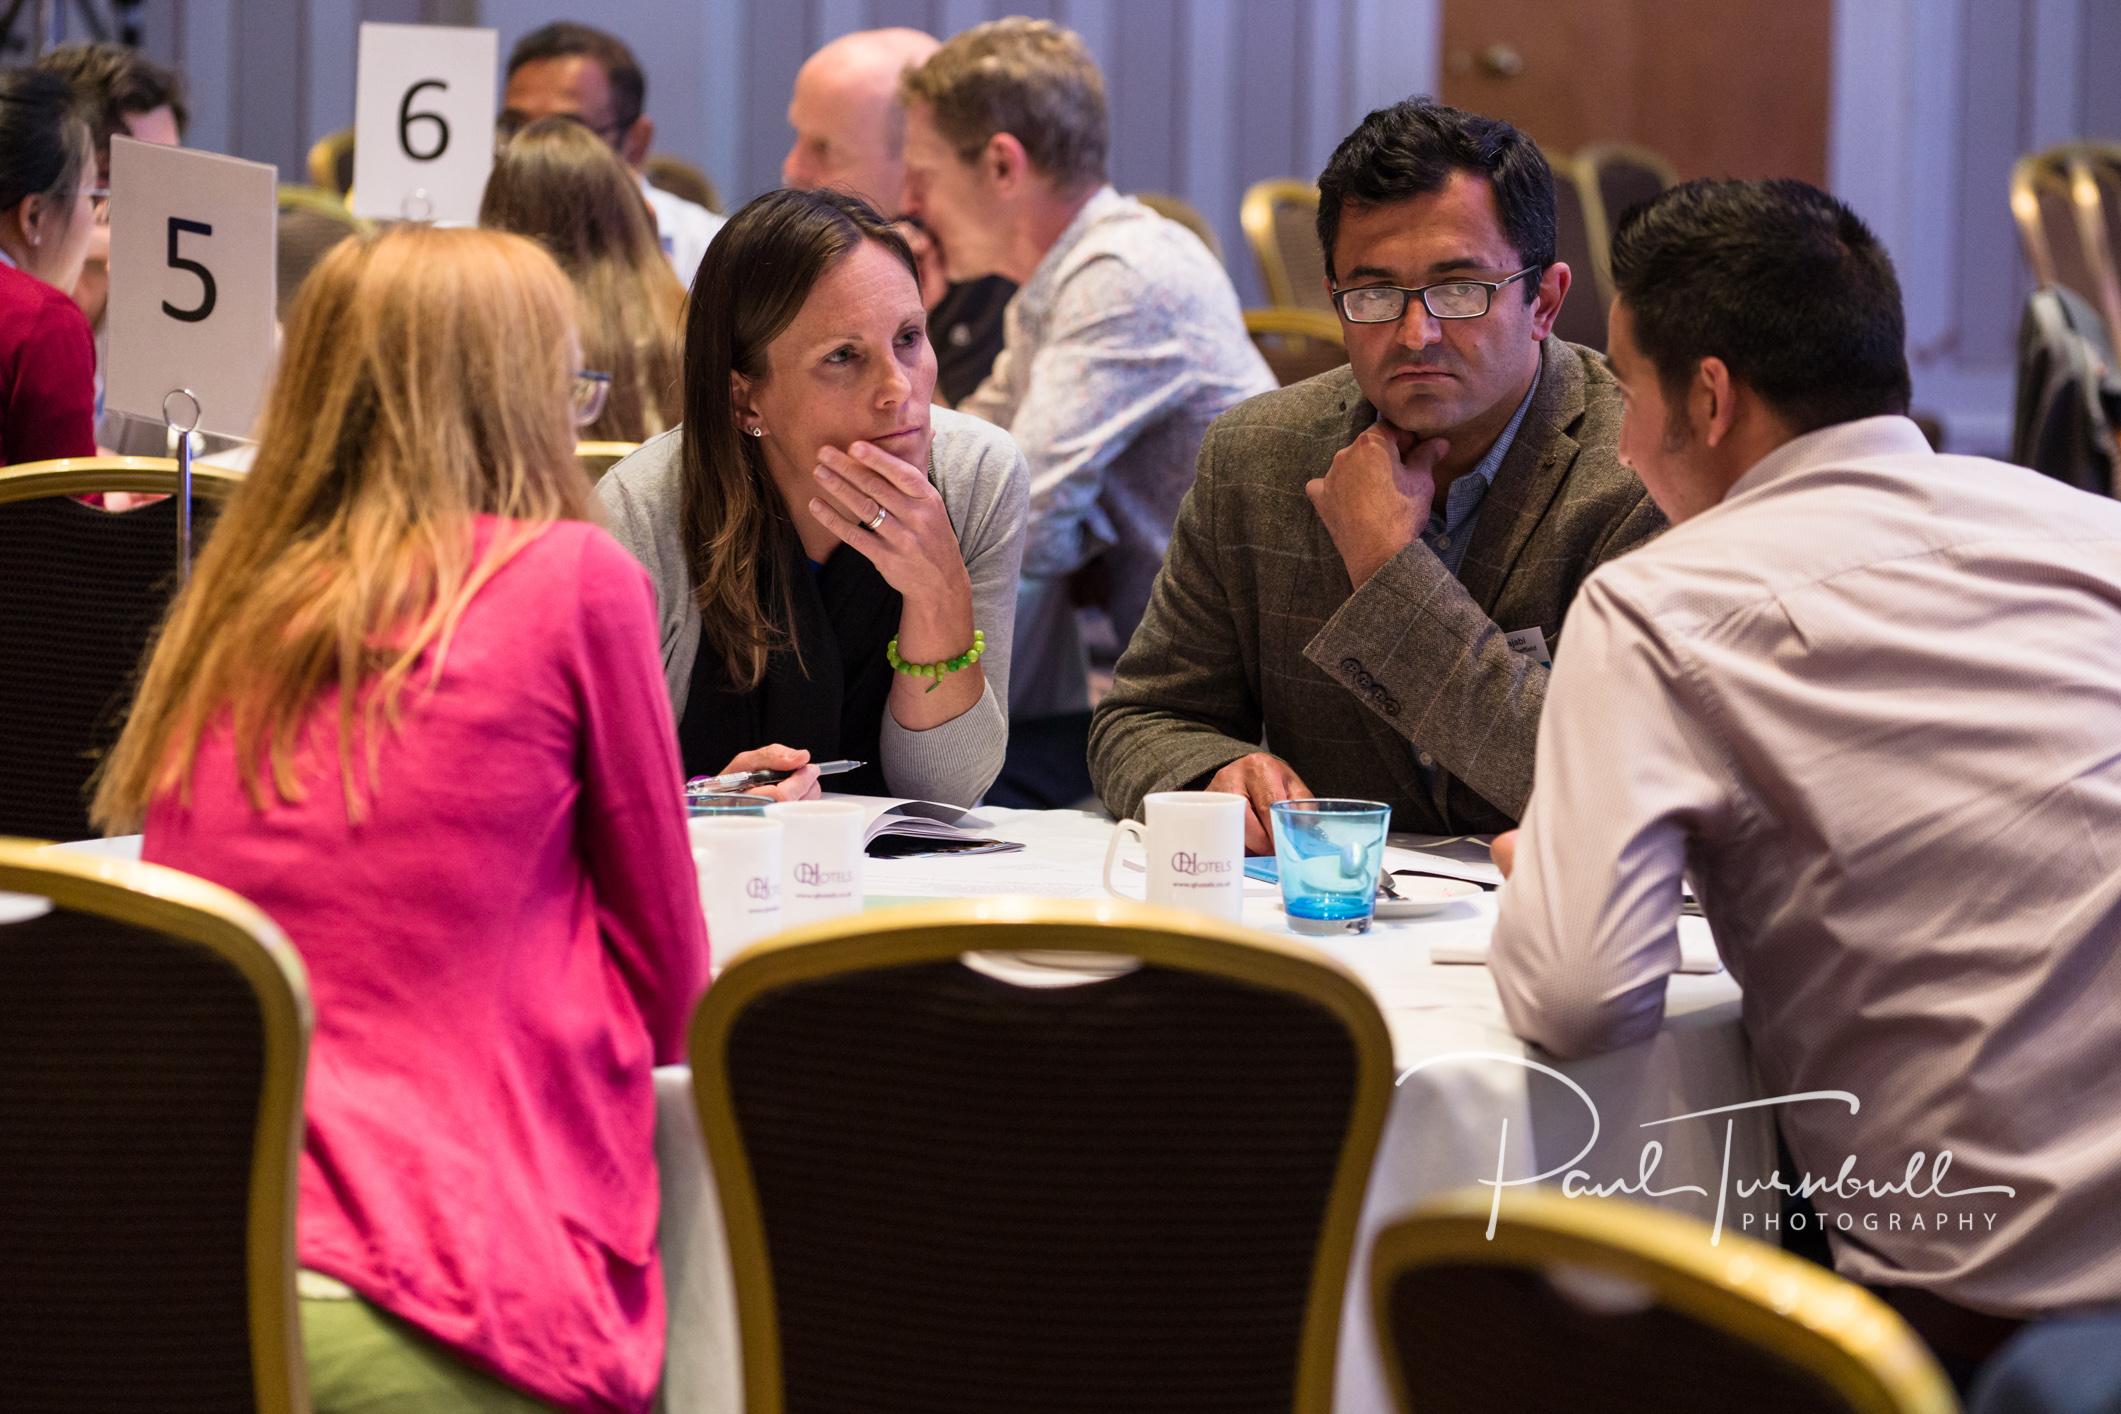 conference-event-photographer-queens-hotel-leeds-yorkshire-069.jpg